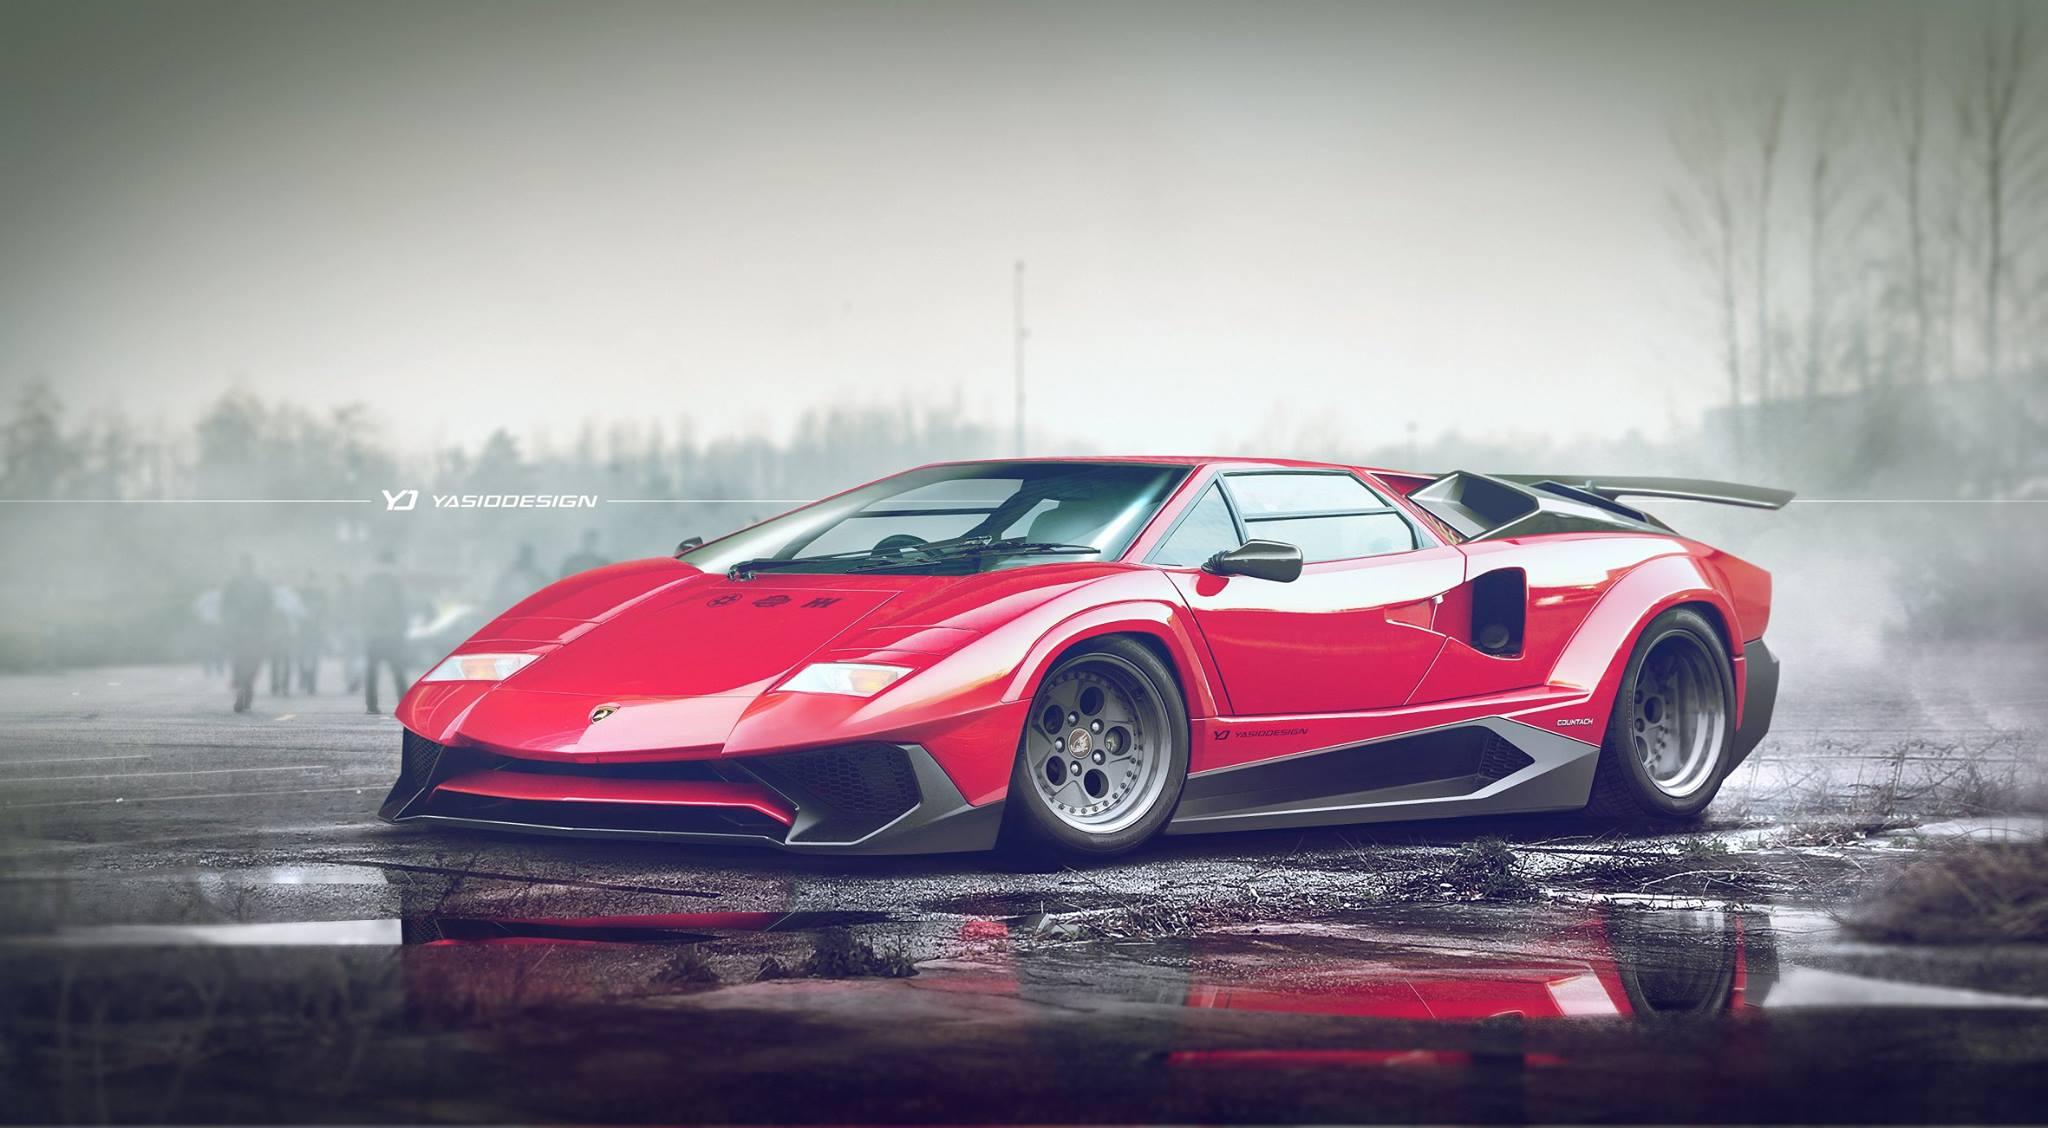 lamborghini-countach-gets-aventador-sv-makeover-in-mind-blowing-mashup-110992_1 Cool Lamborghini Countach Diecast 1 18 Cars Trend